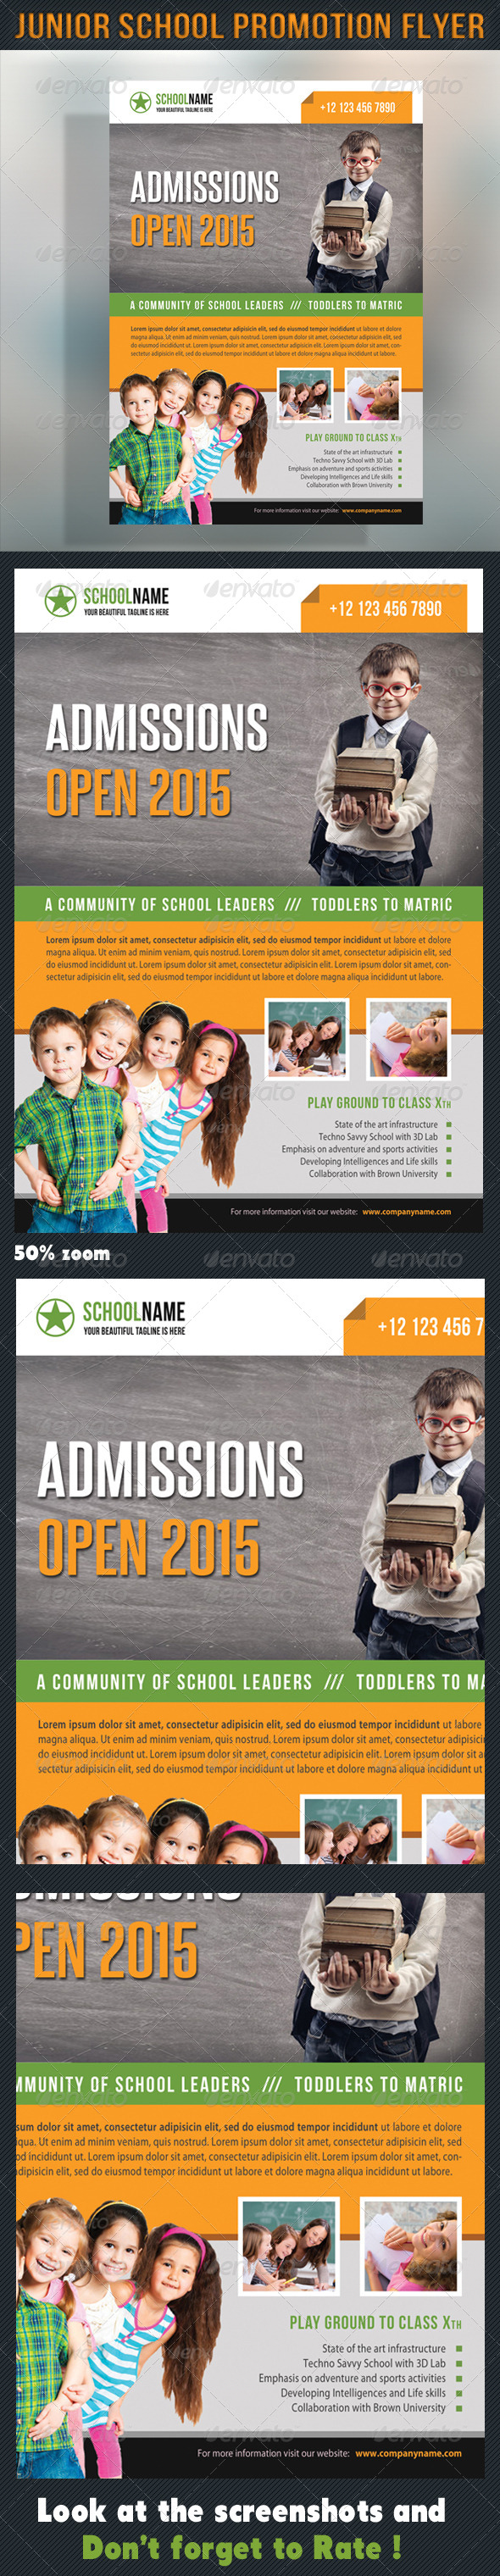 GraphicRiver Junior School Promotion Flyer 10 8644283